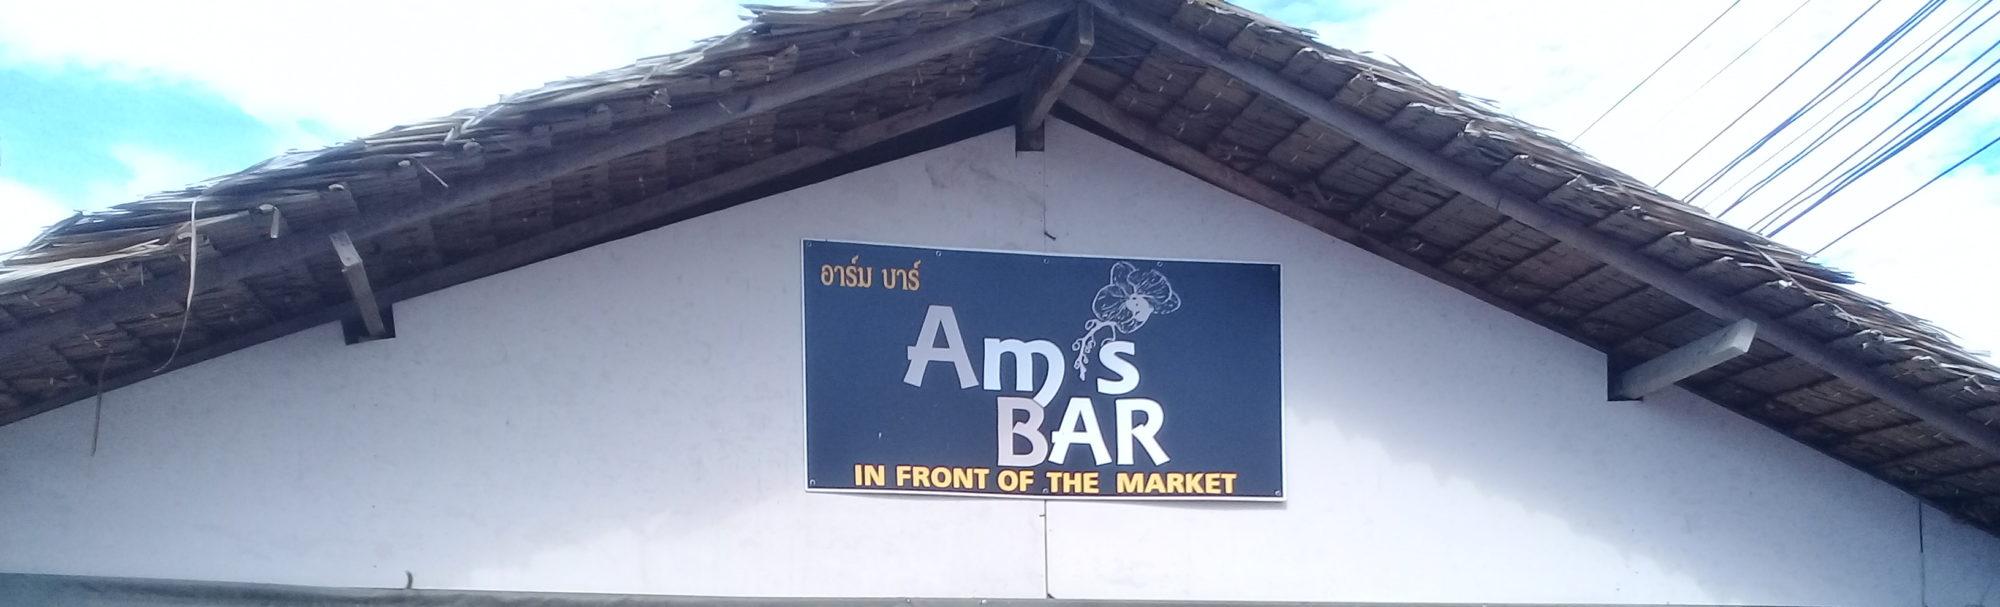 Am' s Bar